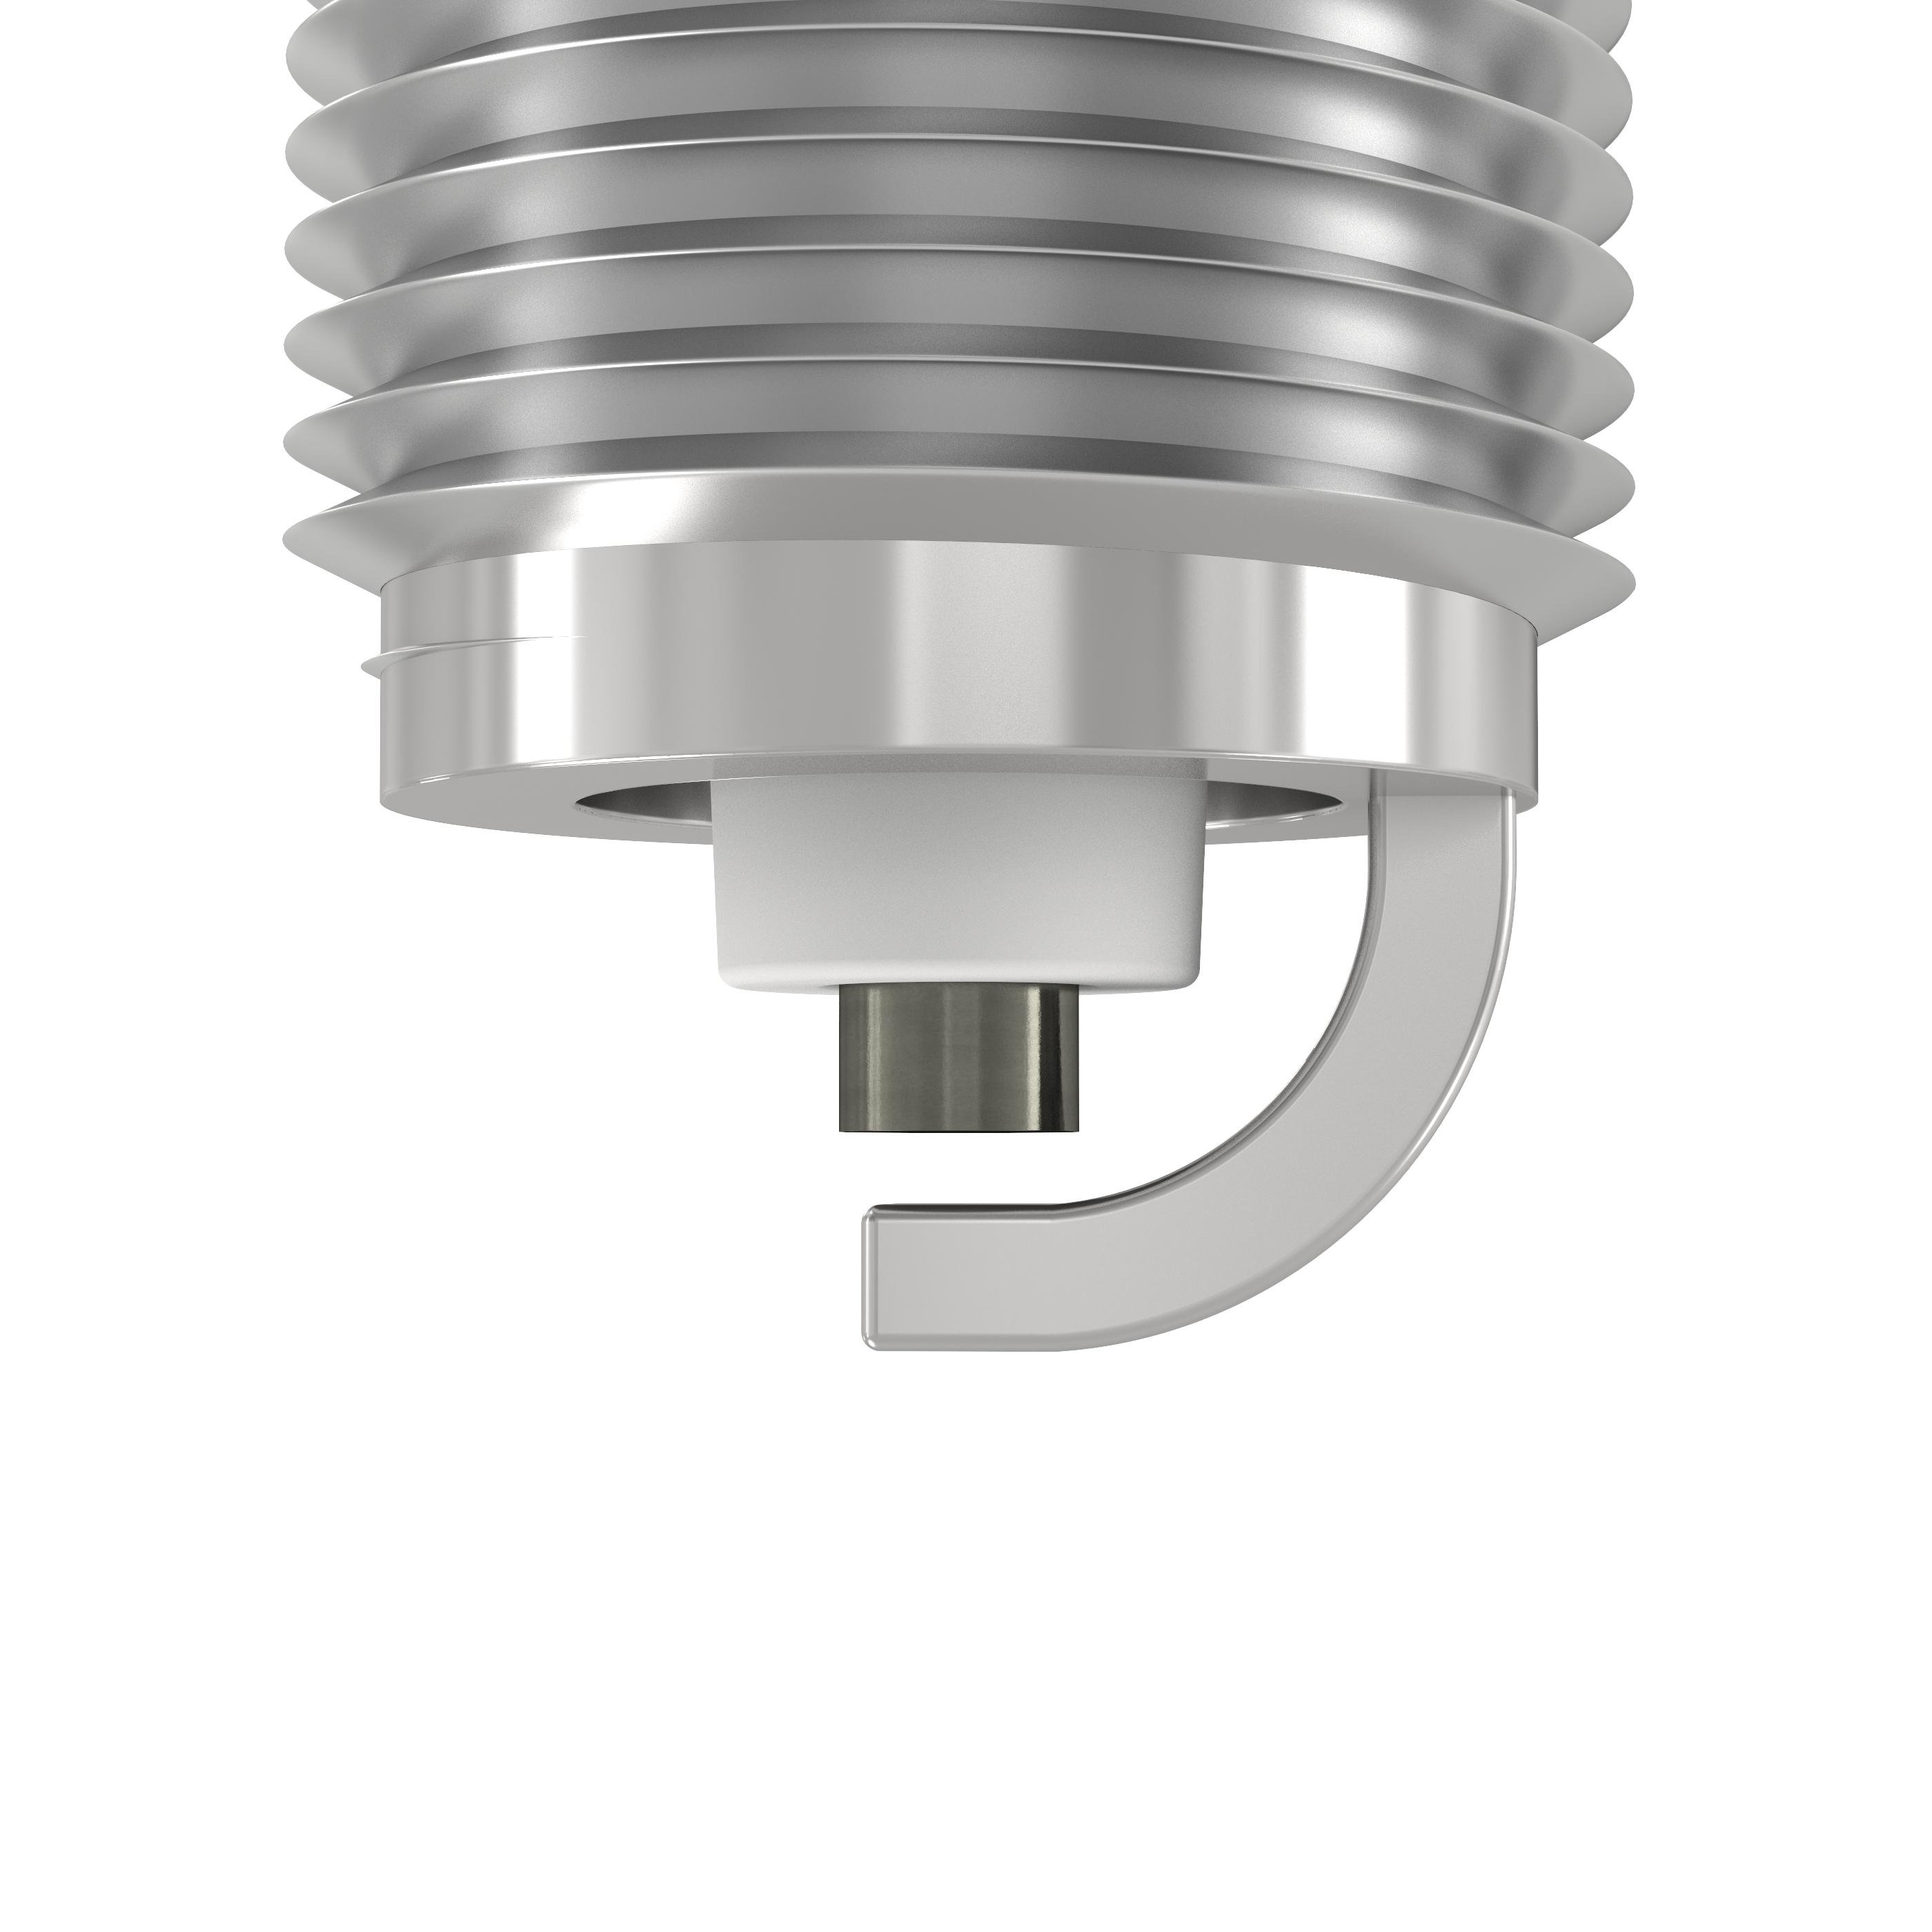 1x Denso Standard Spark Plugs W20FPR-U W 20 fpru 067700-3831 0677003831 3070